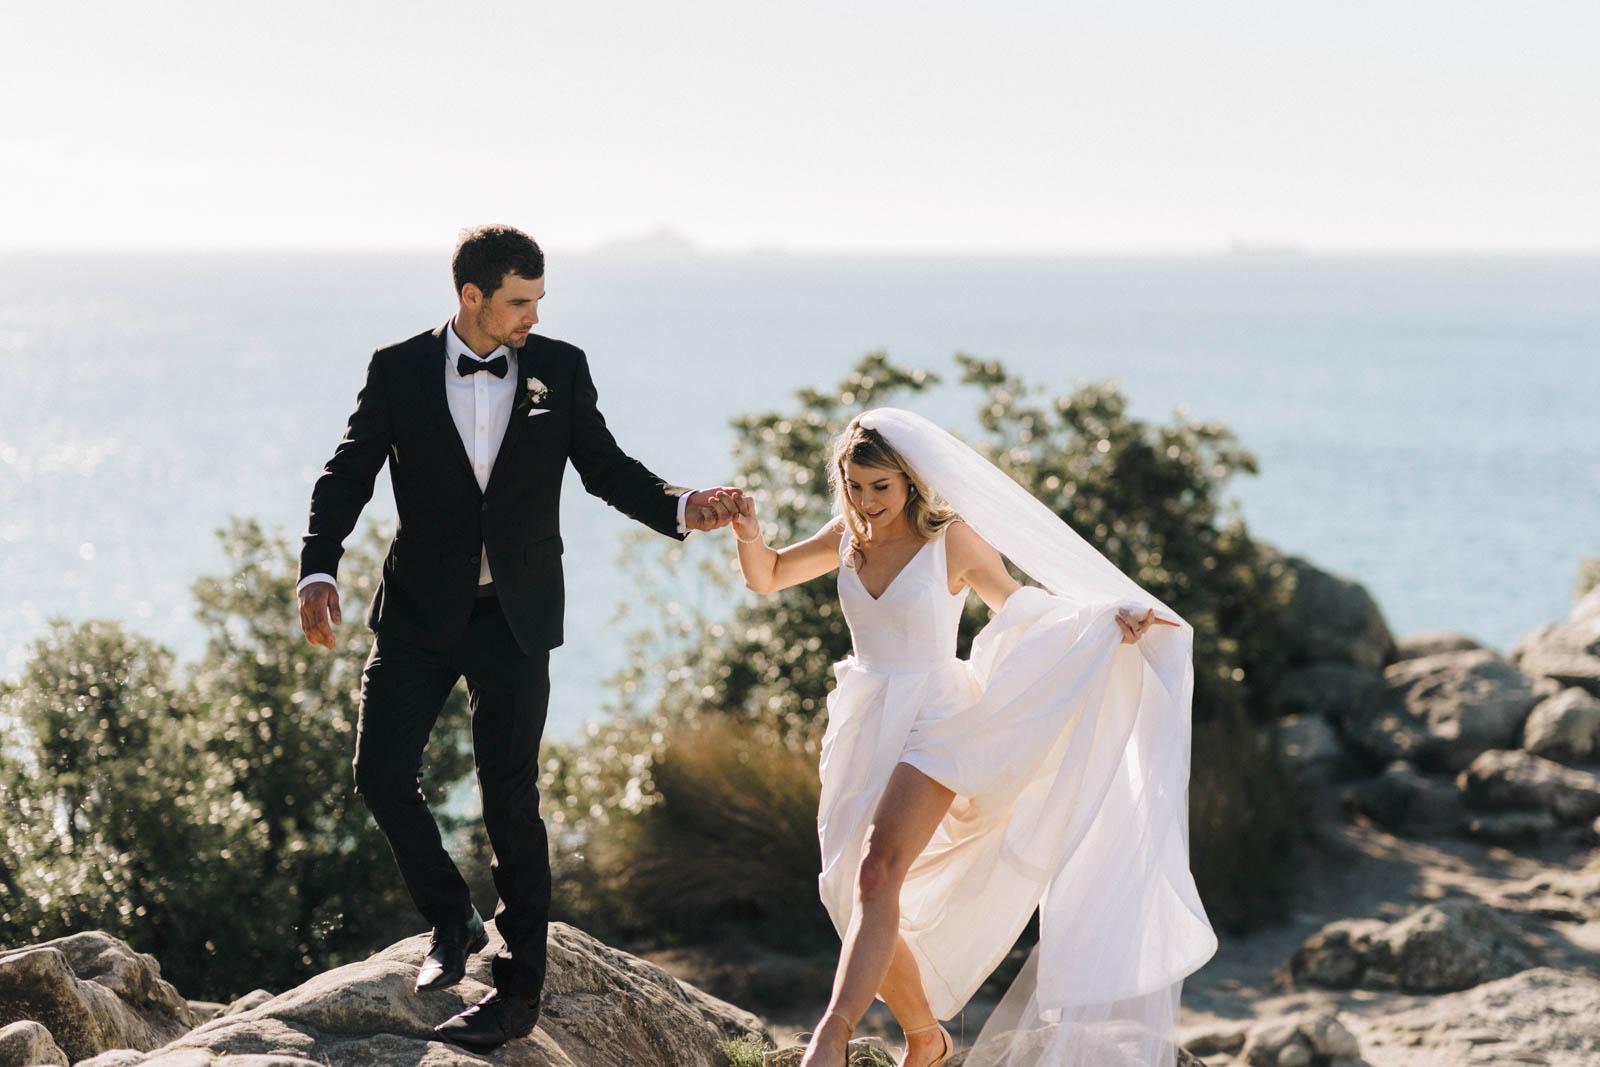 newfound-s-p-mt-maunganui-tauranga-wedding-photographer-1554-A9_05569